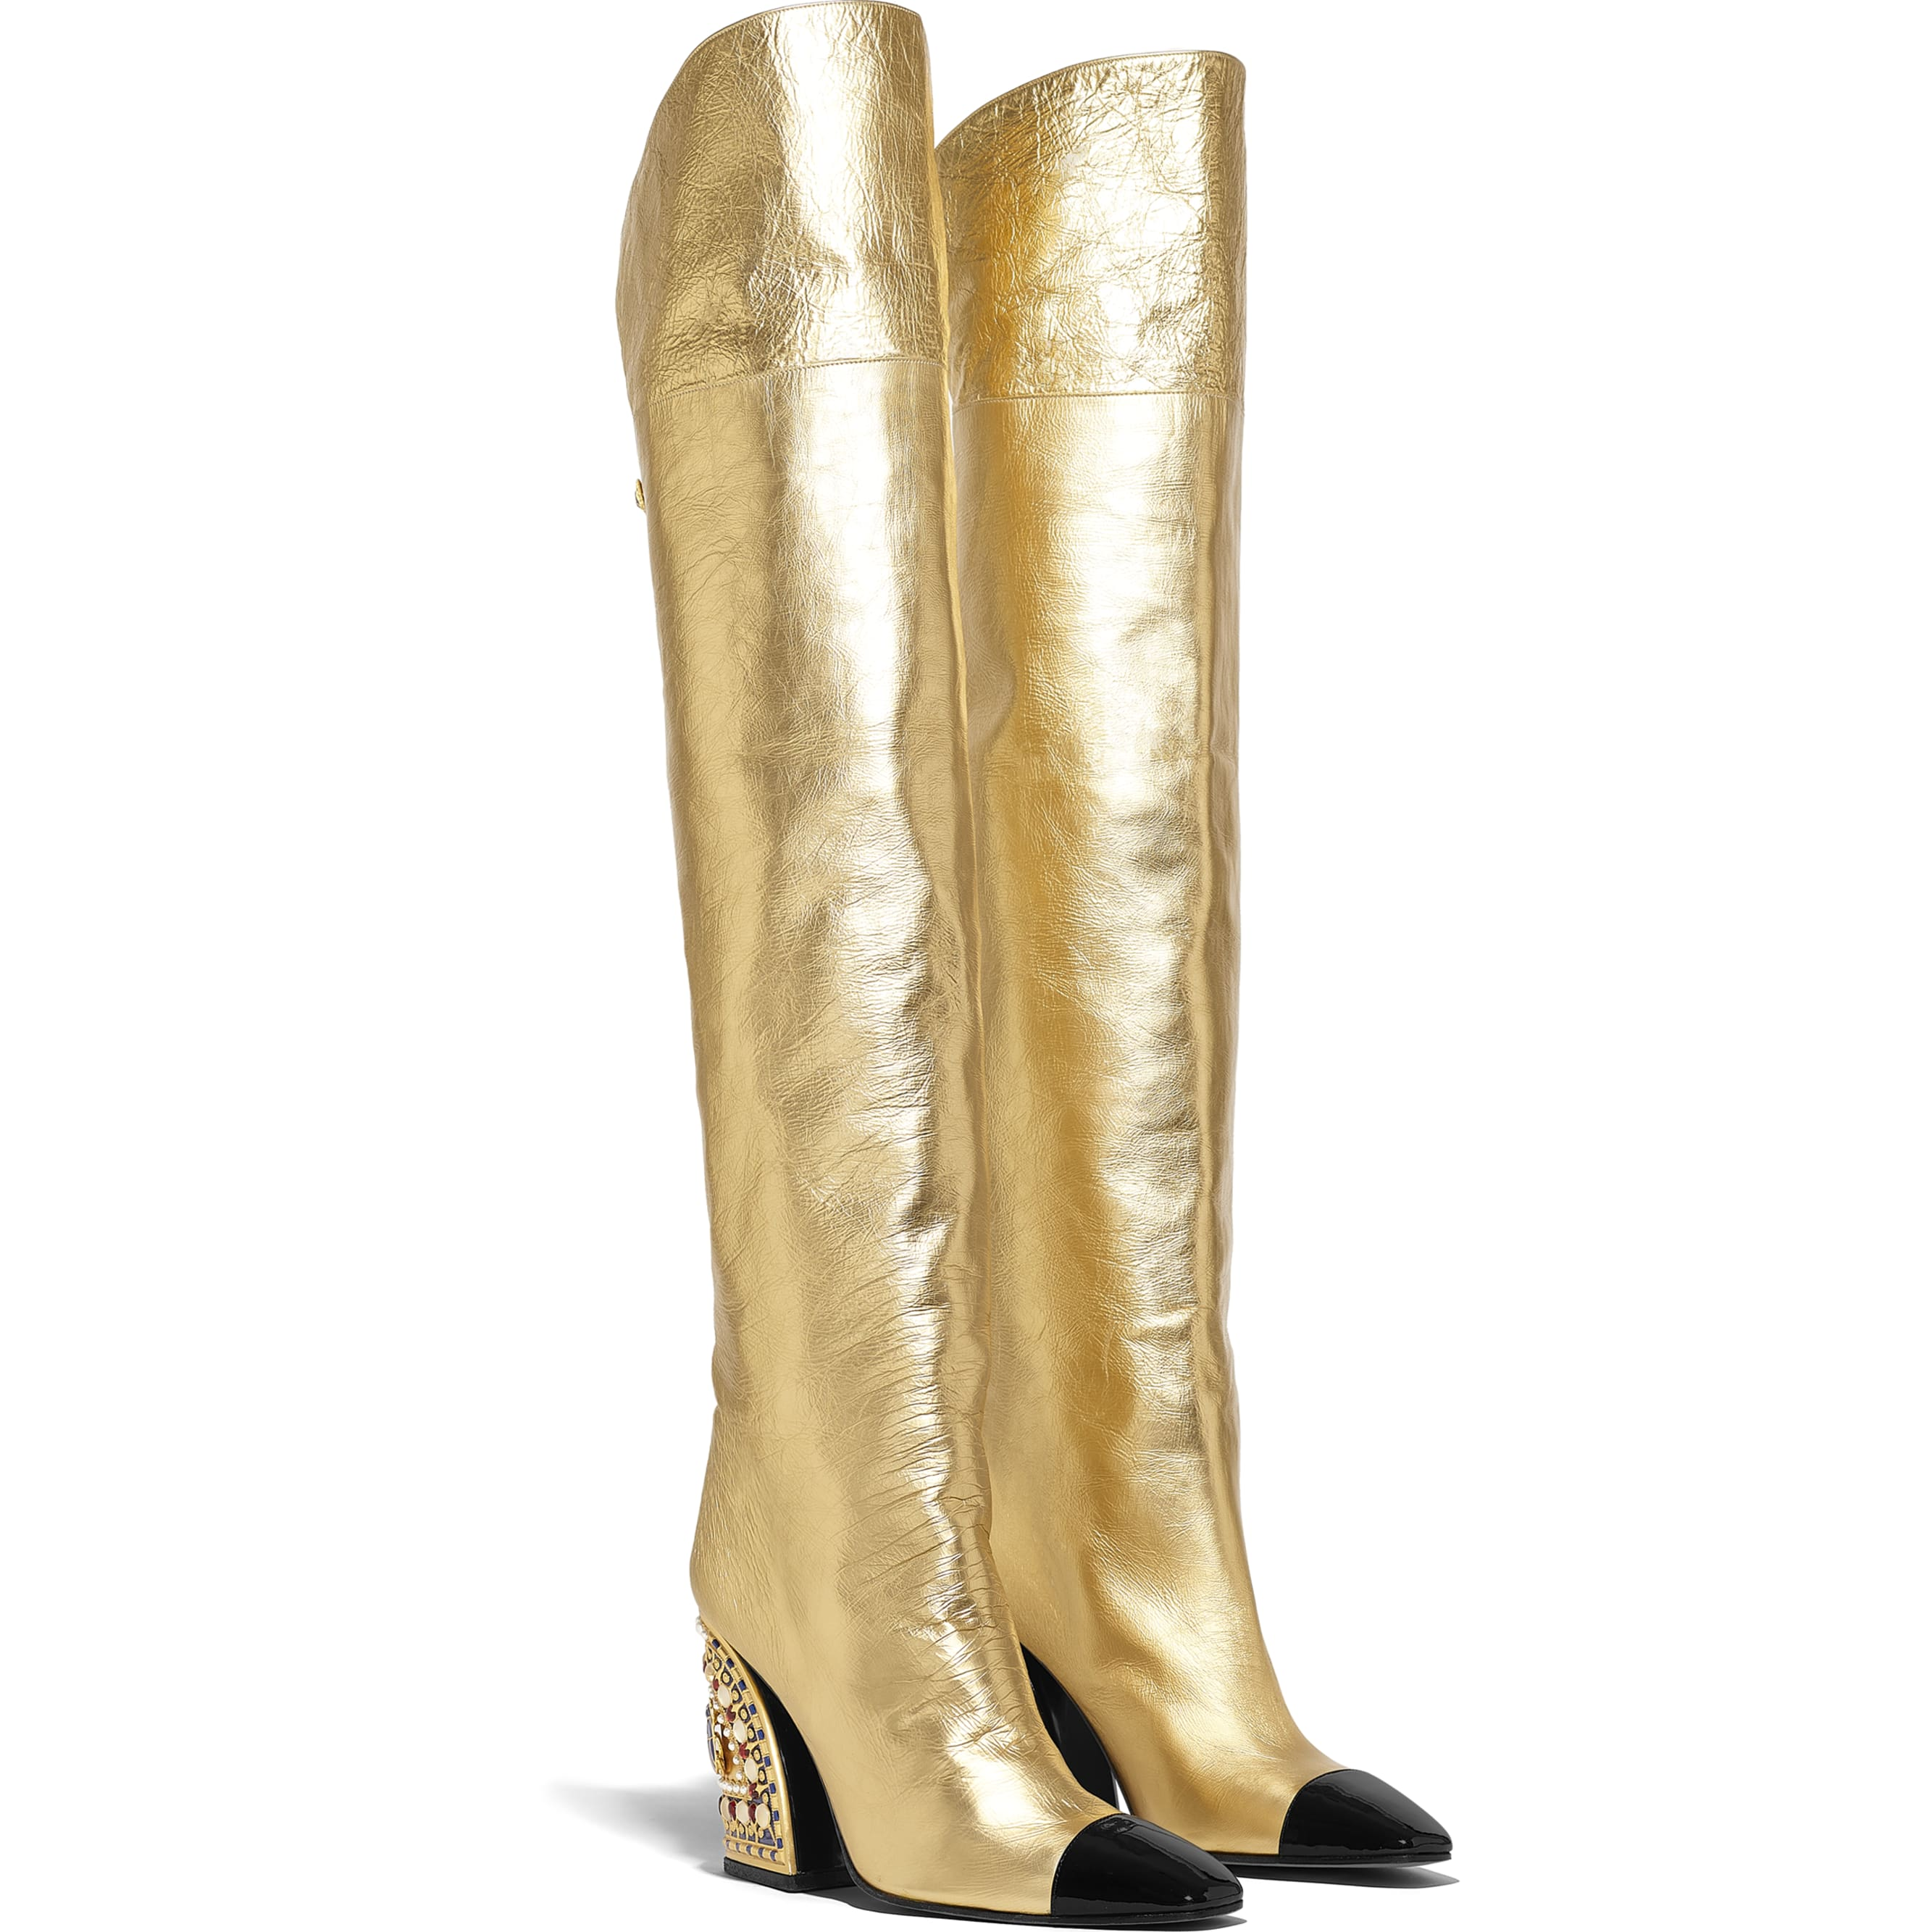 High Boots - Gold & Black - Laminated Lambskin & Patent Calfskin - Alternative view - see standard sized version